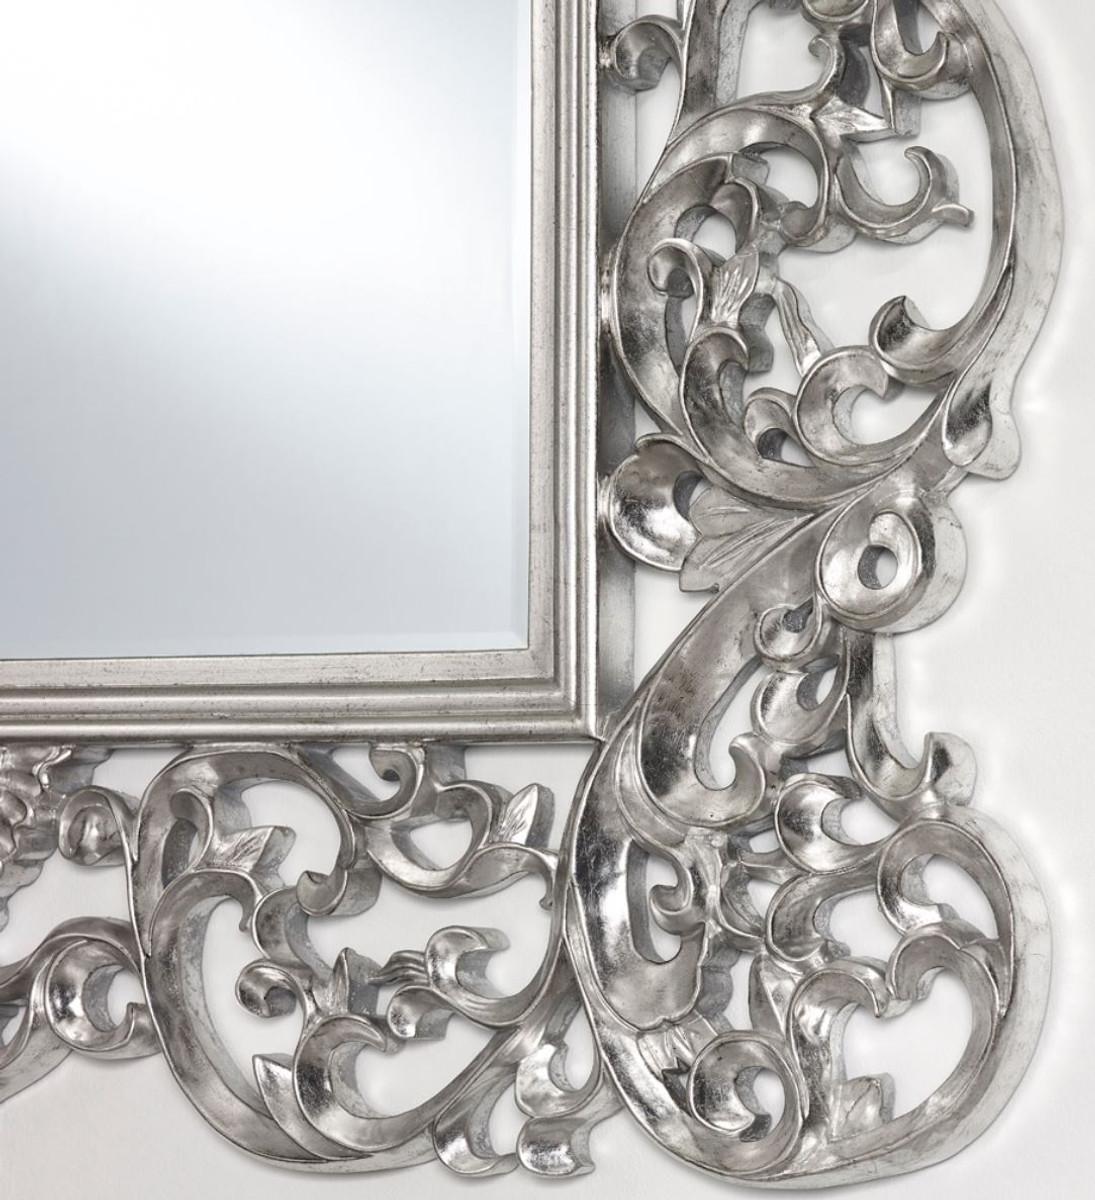 Casa padrino barock spiegel silber 105 x h 154 cm edel prunkvoll spiegel barock spiegel - Barock wandspiegel silber ...